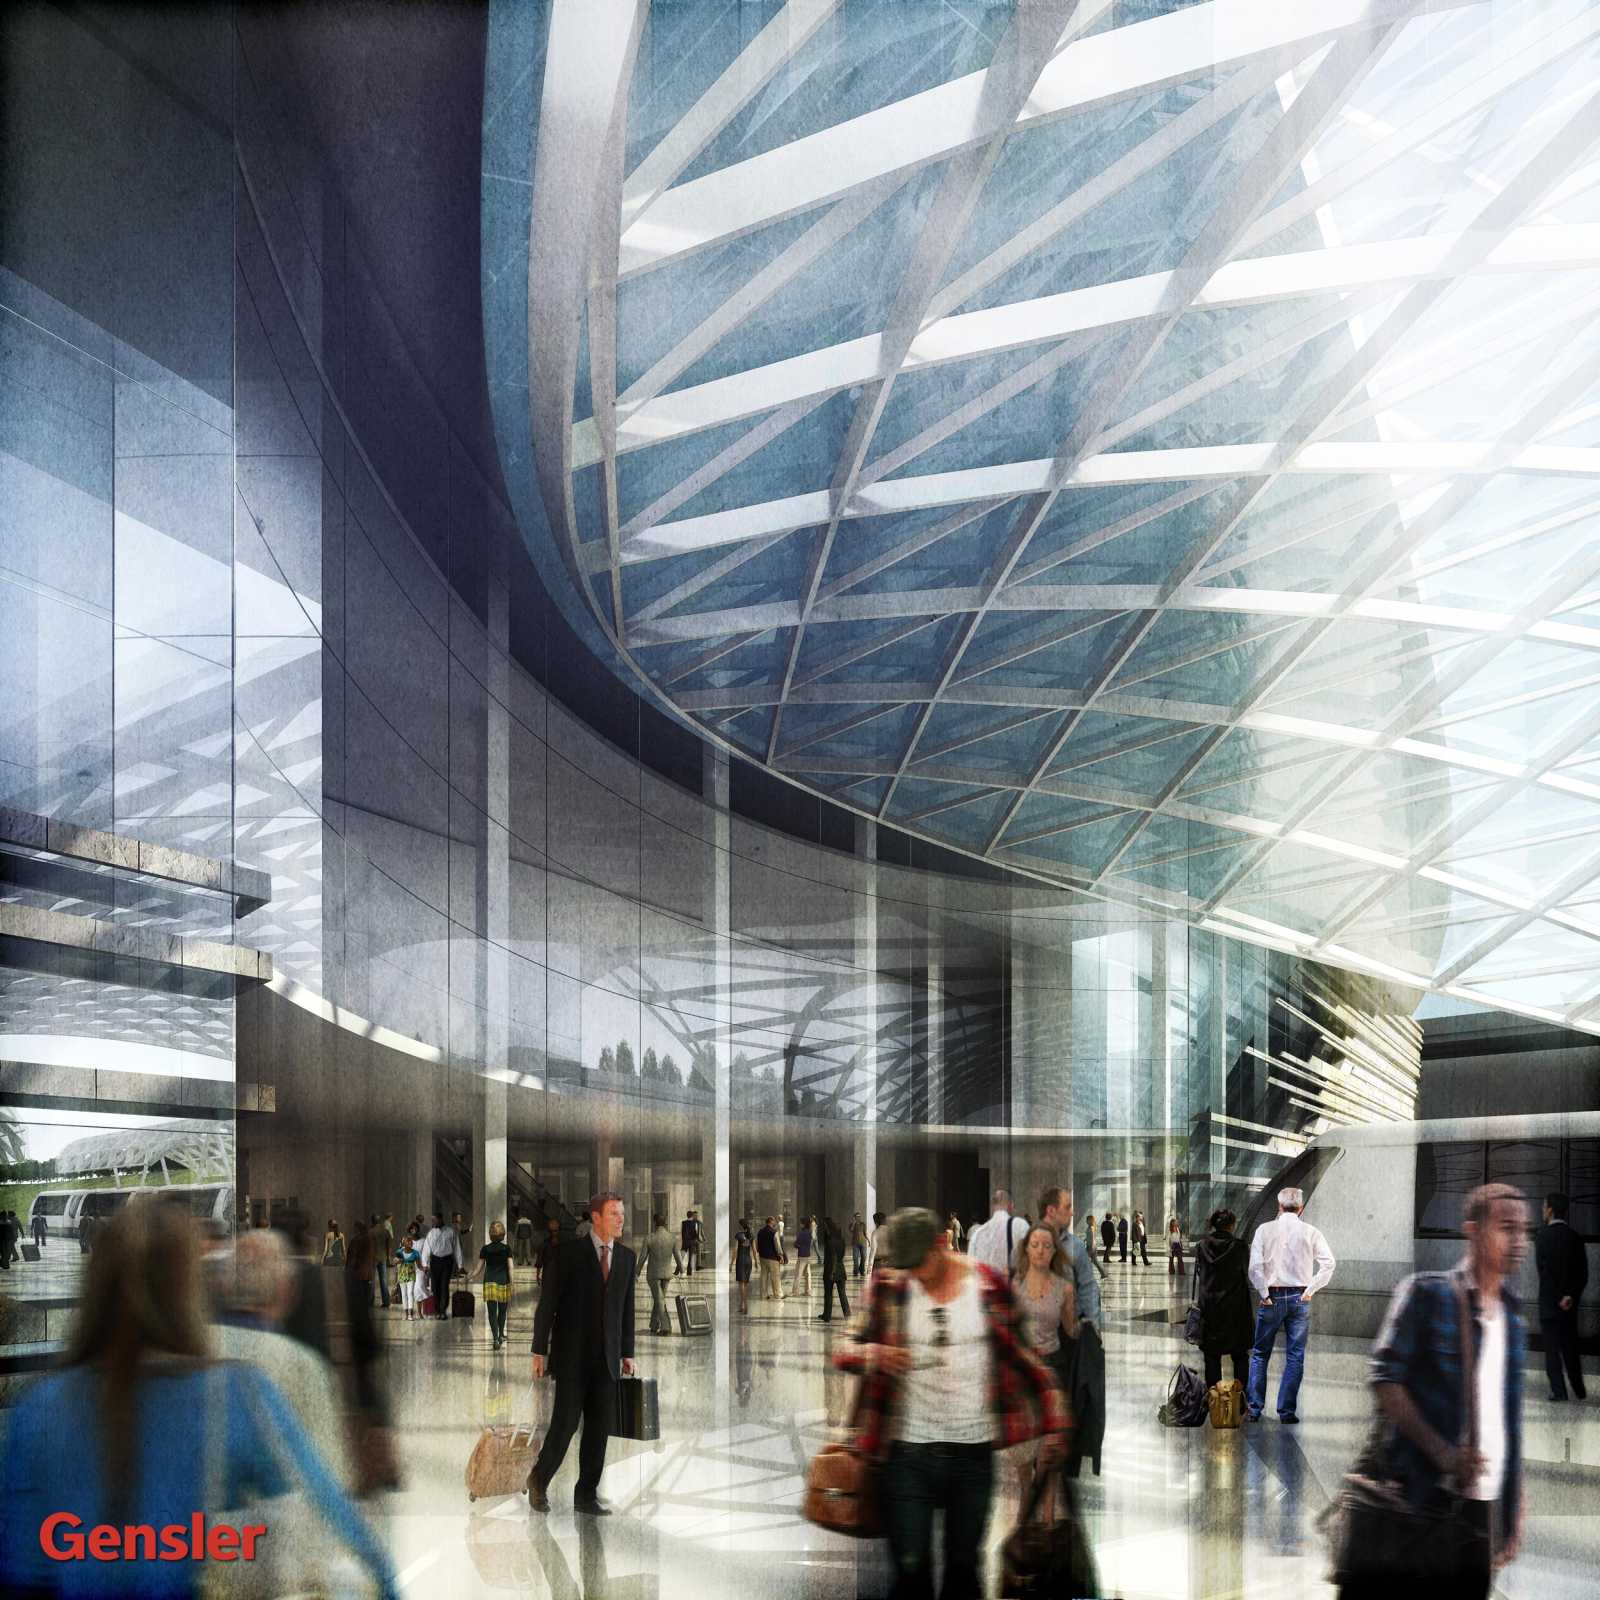 DENVER INTERNATIONAL AIRPORT BY GENSLER